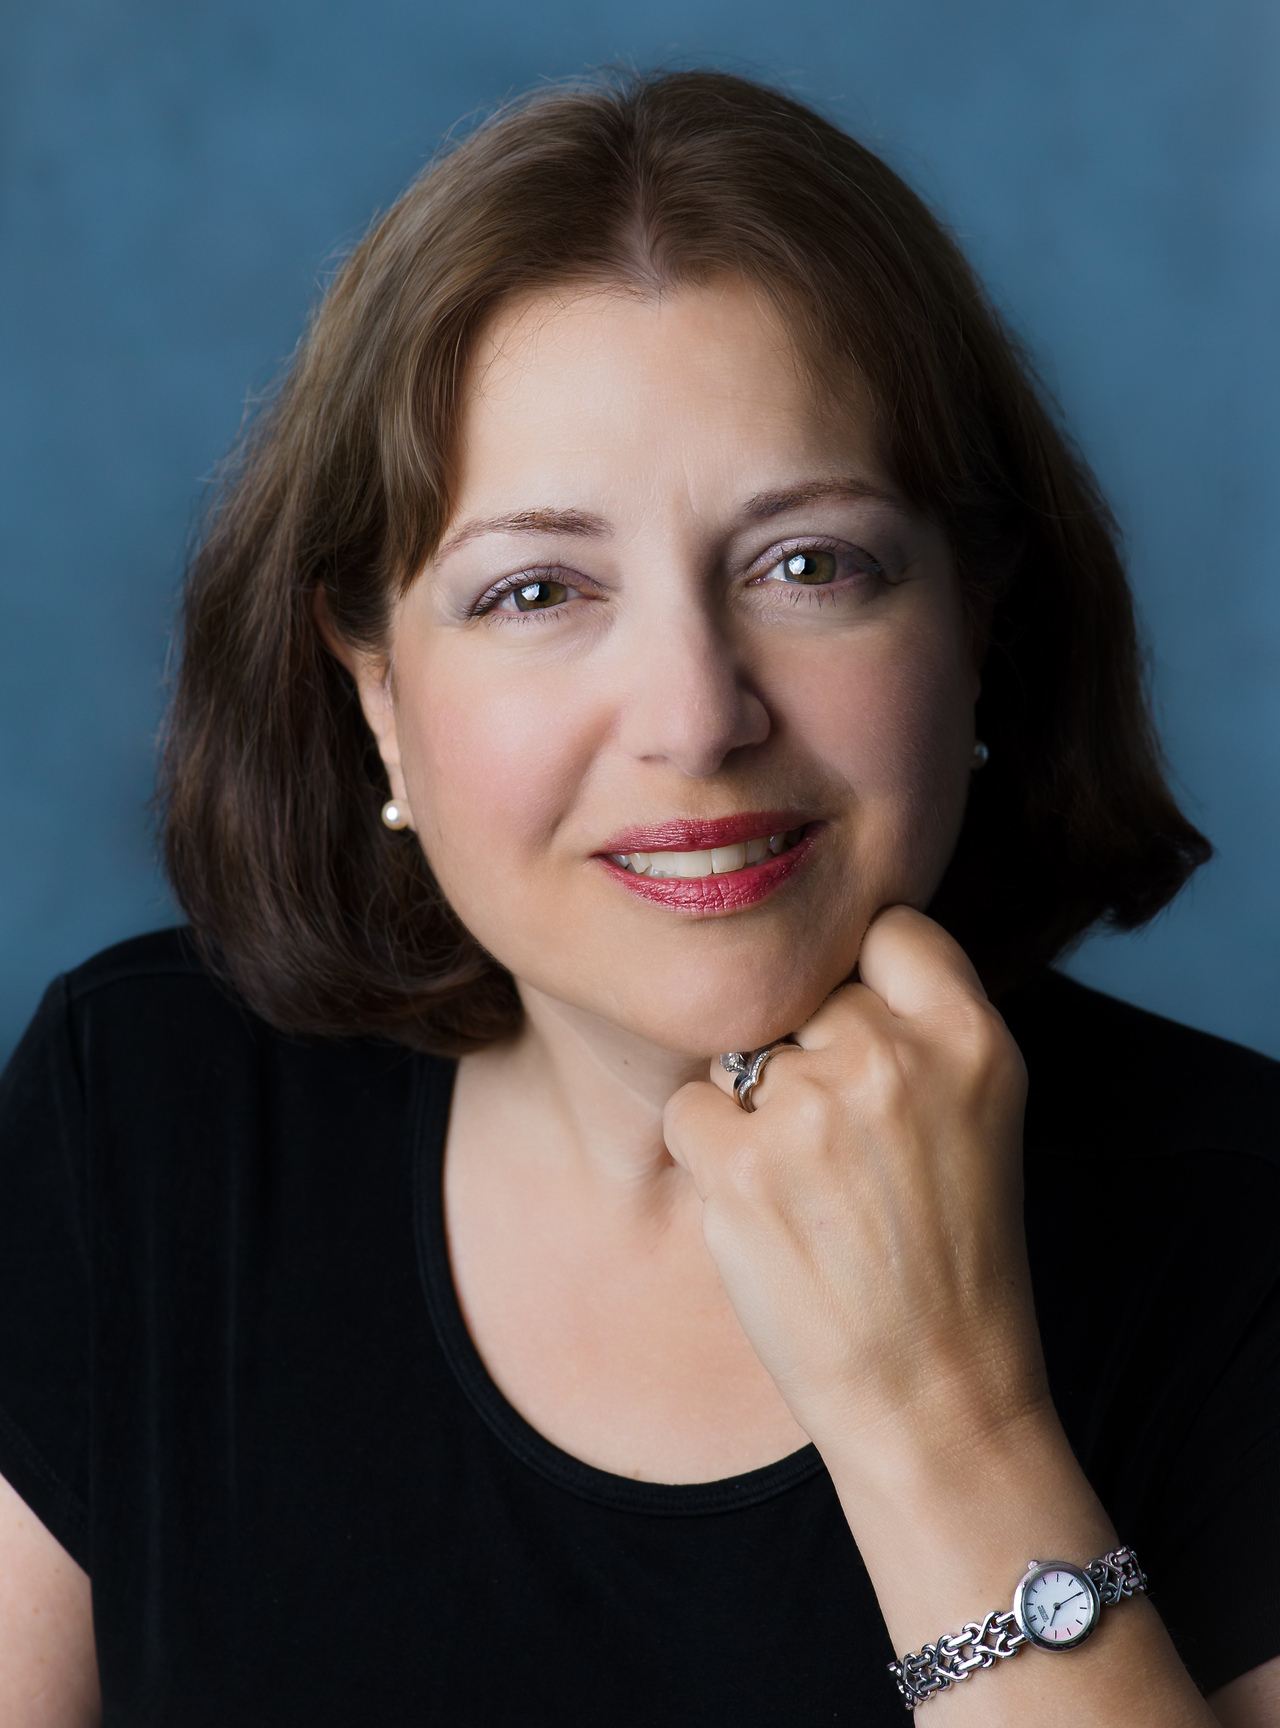 Margie 2012